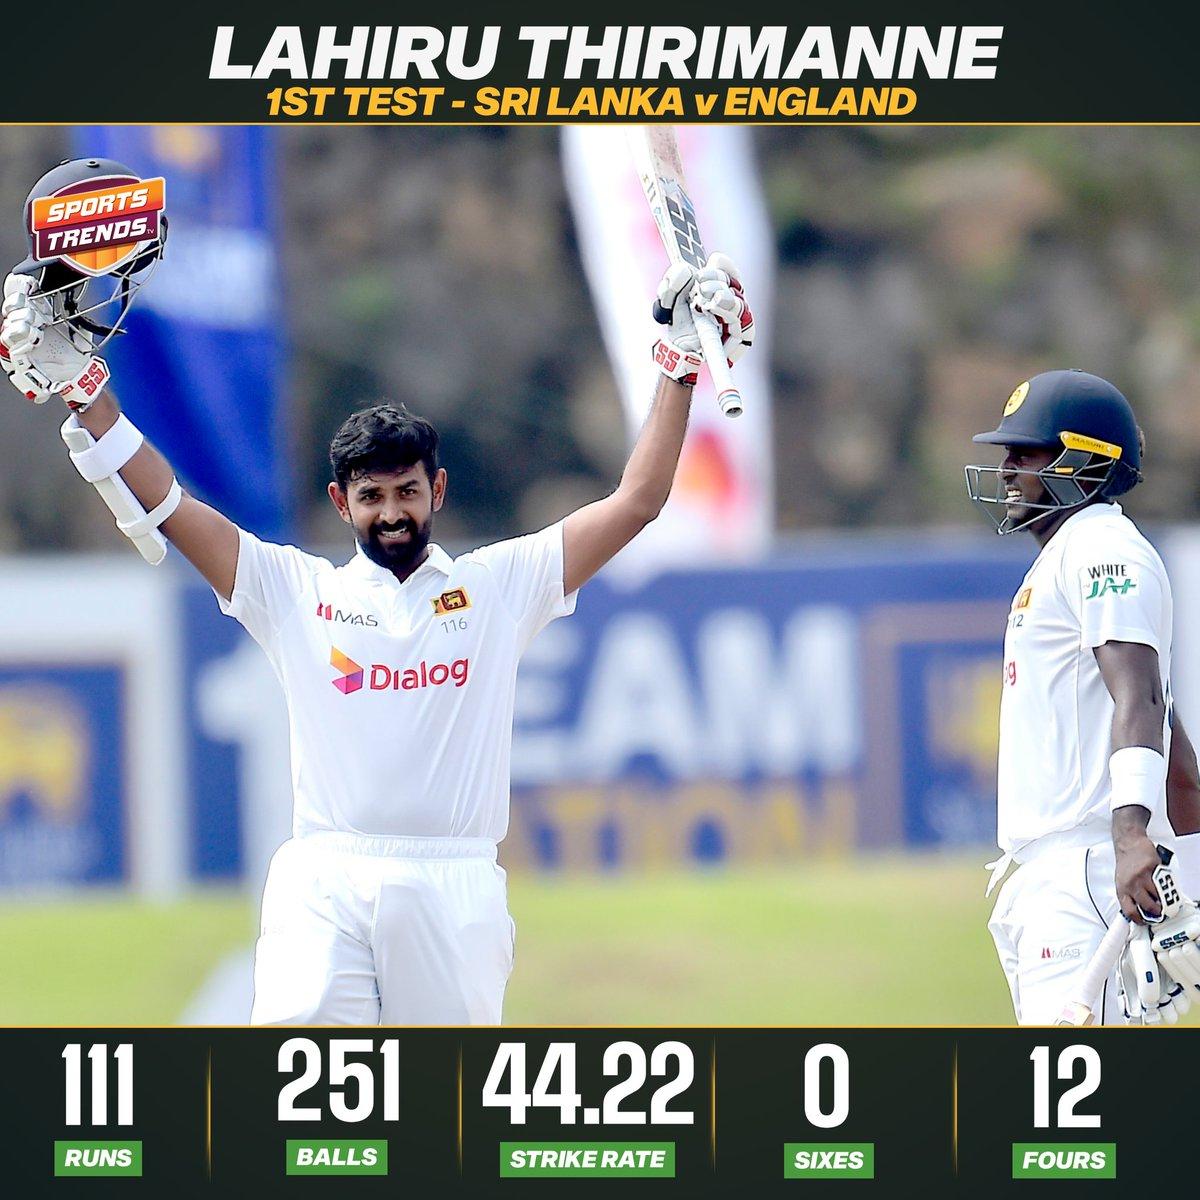 Excellent Hundred From Lahiru Thirimanne 💯  #Cricket #SAvENG #FirstTest #ENGvSL